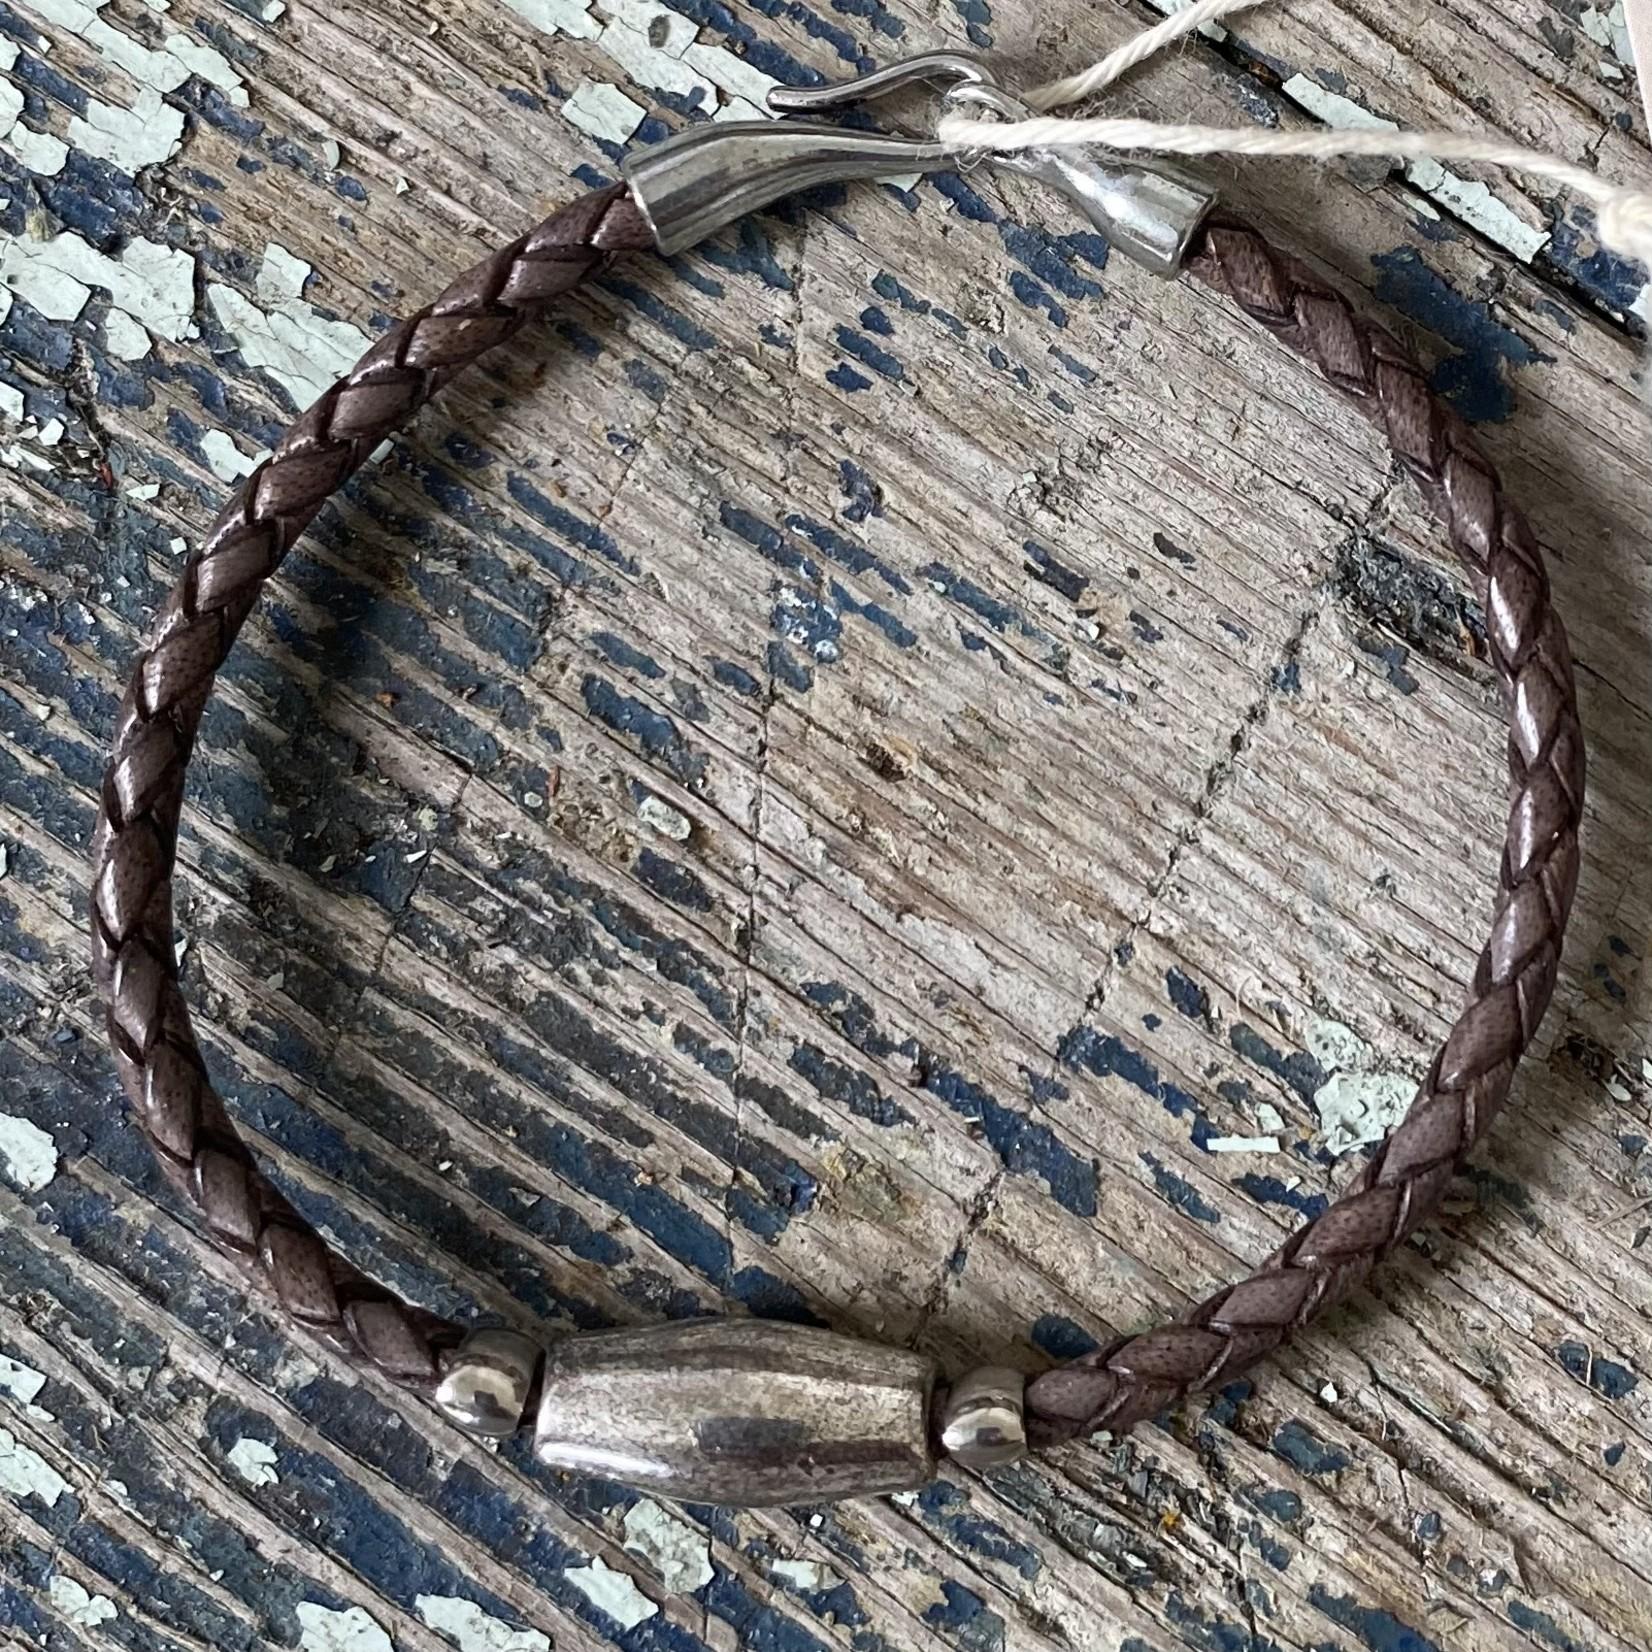 Julia Jones JMJ 921-57 Brown Braided Leather Bracelet -Silver Bead